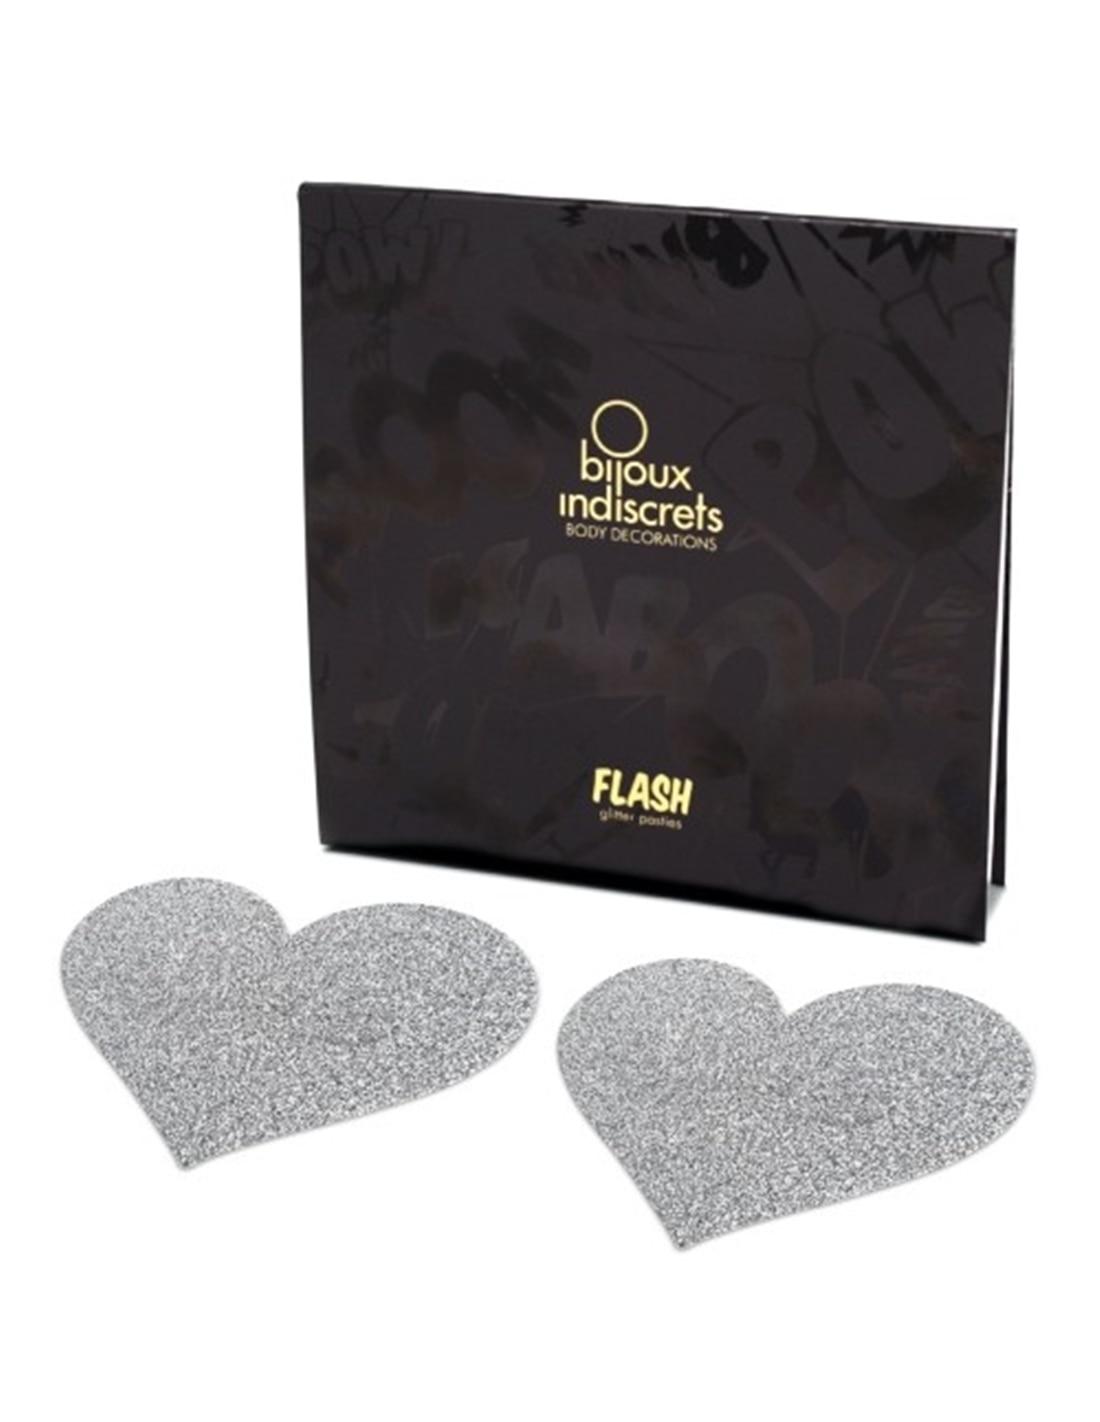 Tapa Mamilos Flash Glitter Heart Bijoux Indiscrets Prateados - PR2010324336